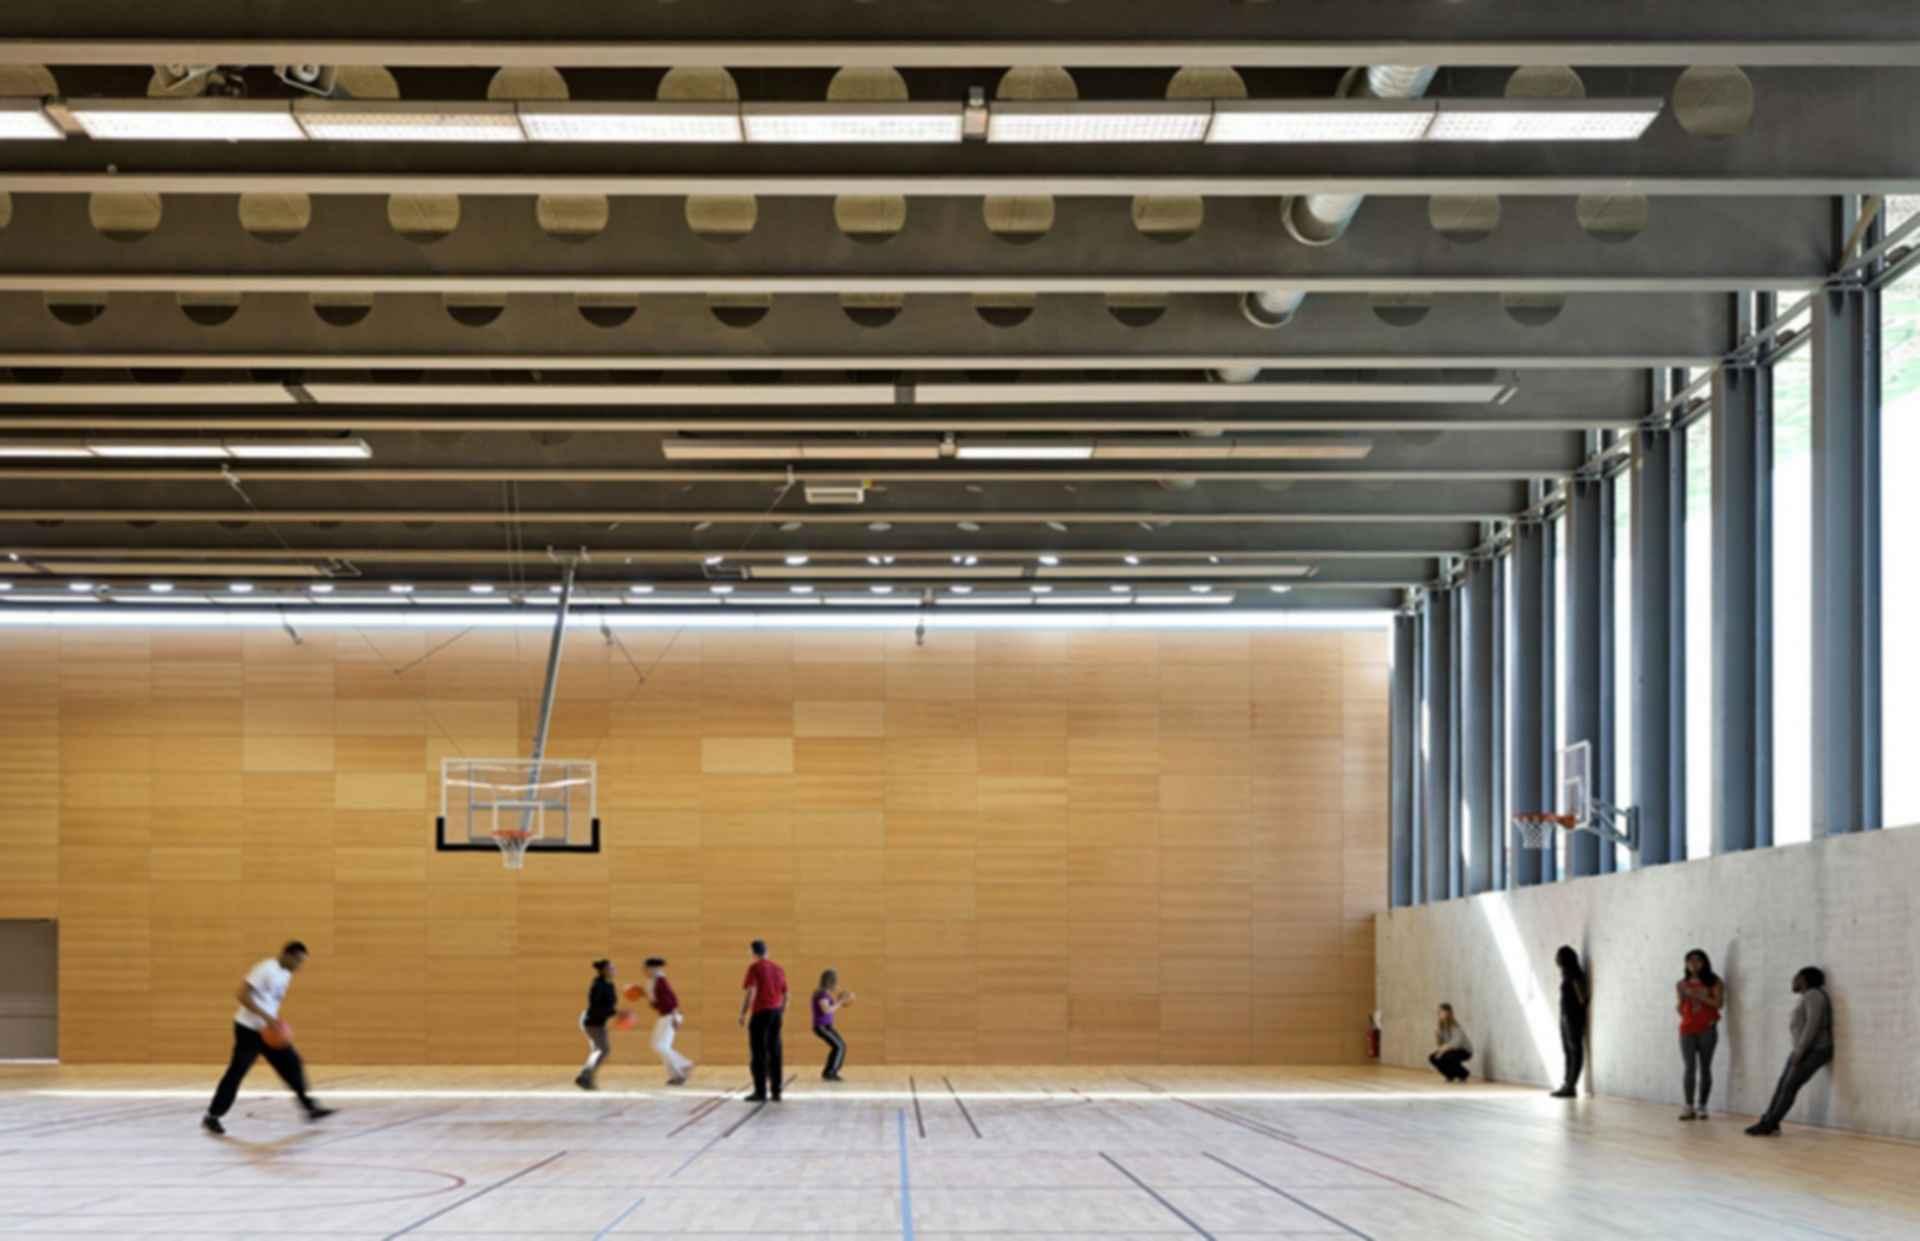 Sports Center Jules Ladoumegue - Interior/Basketball Court